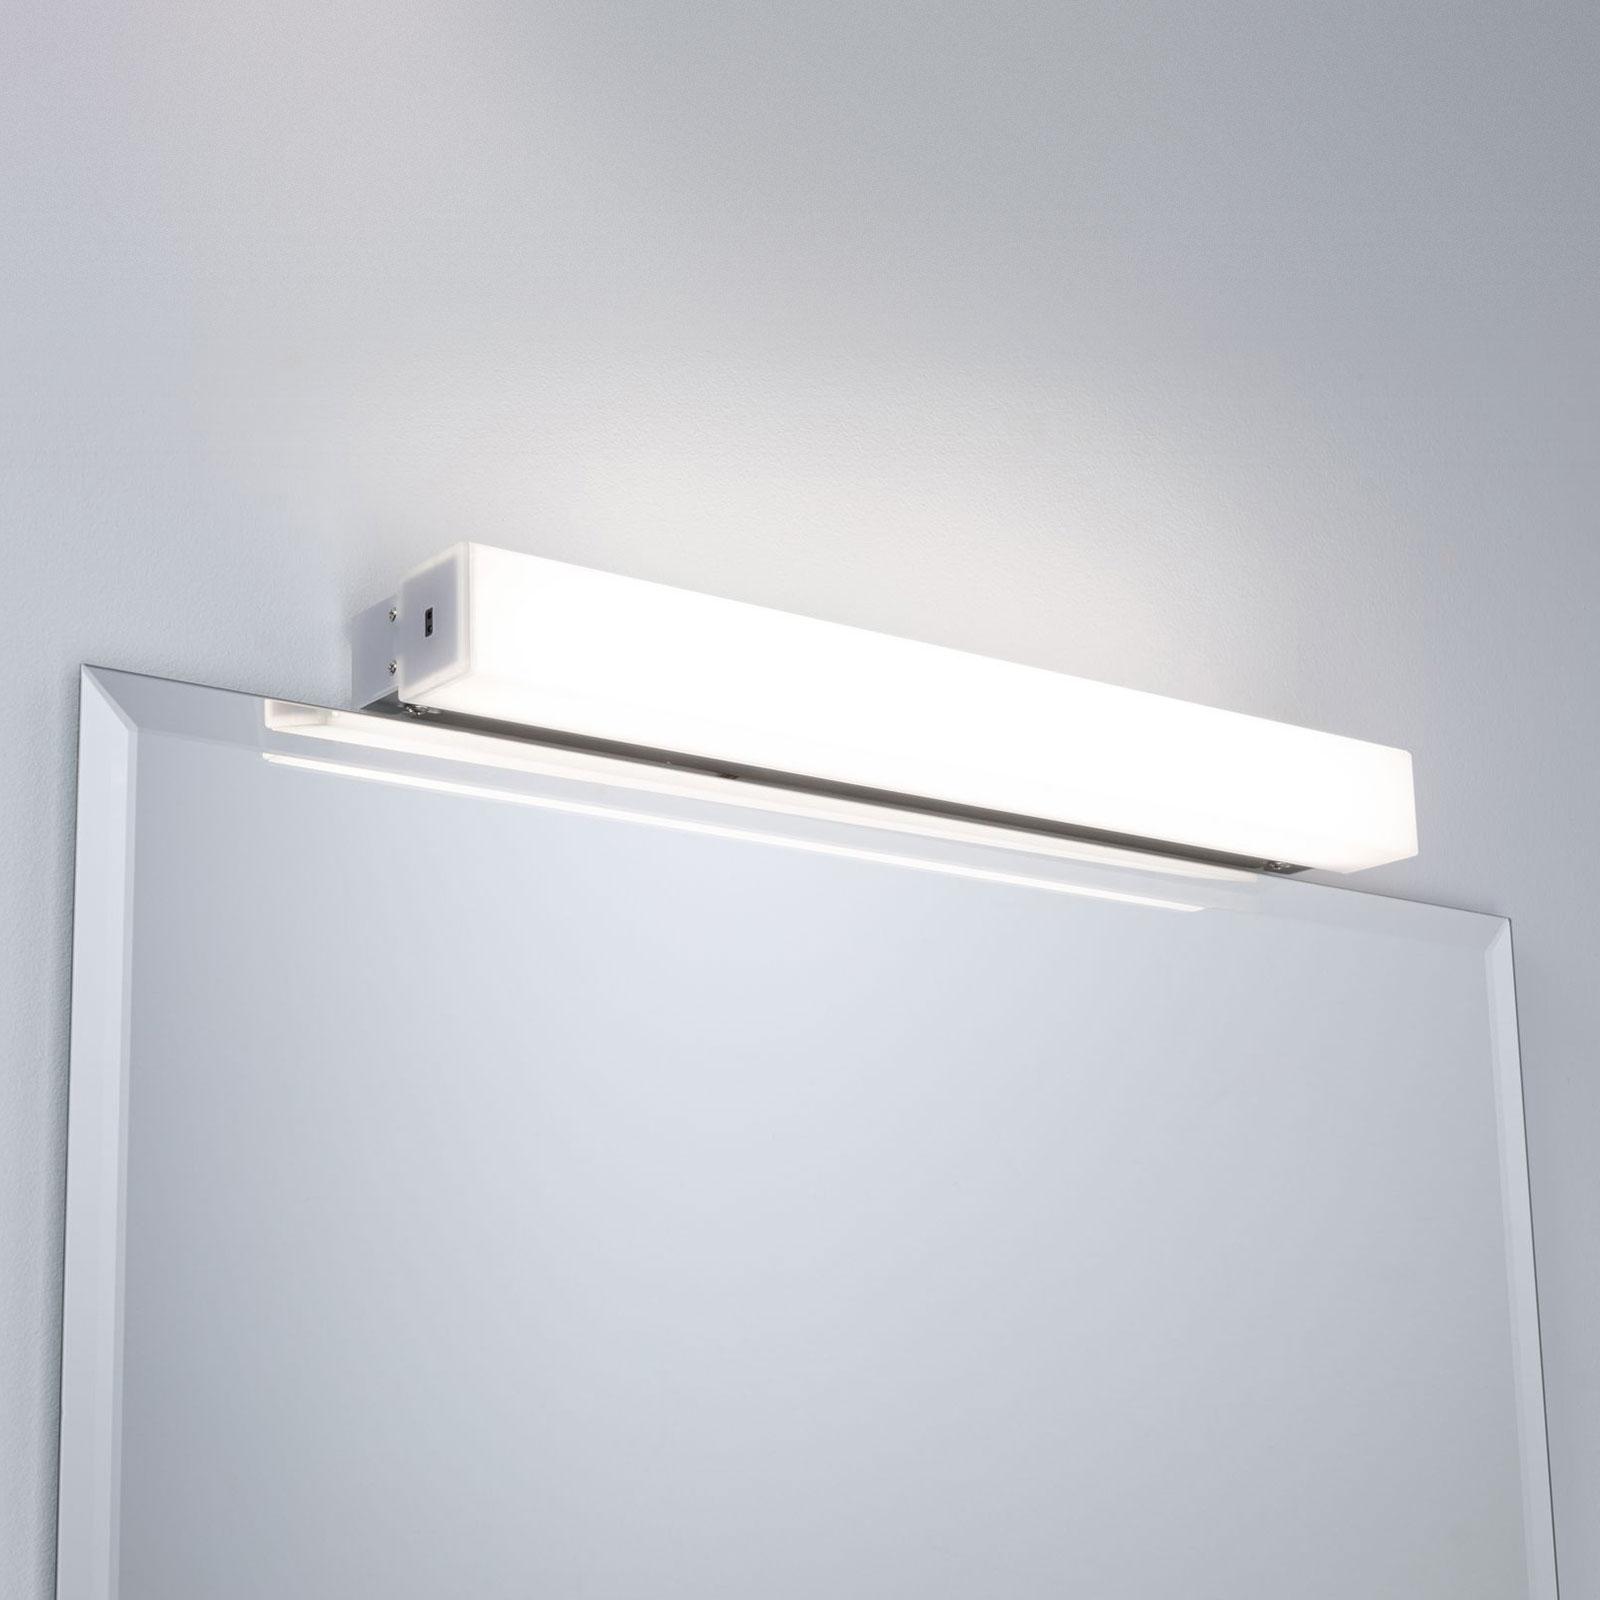 Paulmann HomeSpa Luno LED-speillampe, 40 cm